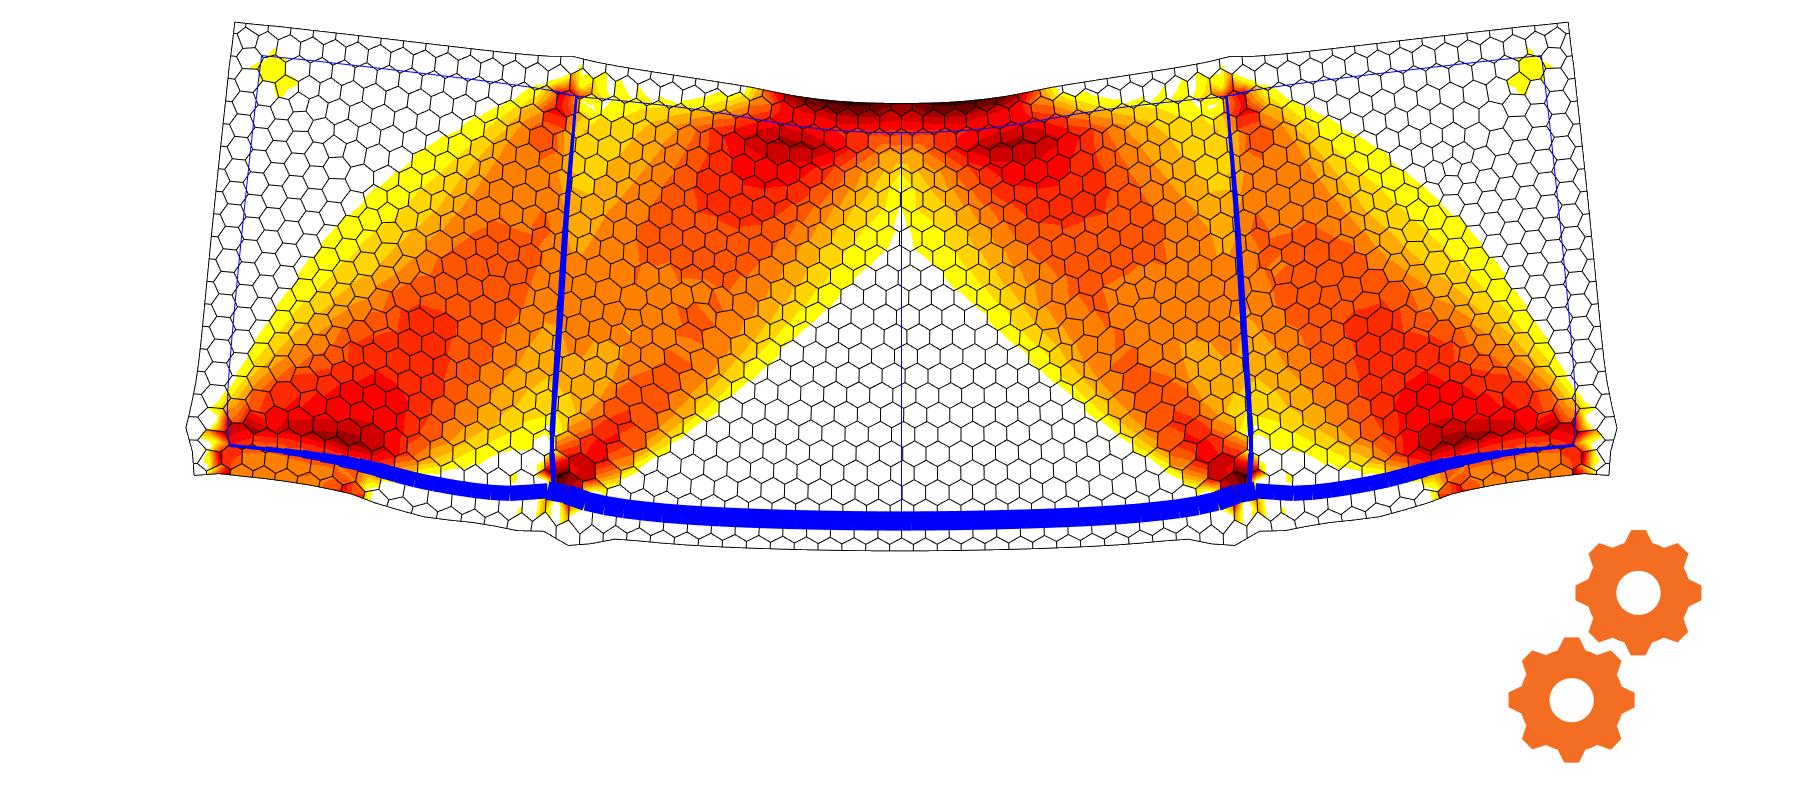 Compatible Stress Field method 2D (CSFM 2D) IDEA statica beton elementen